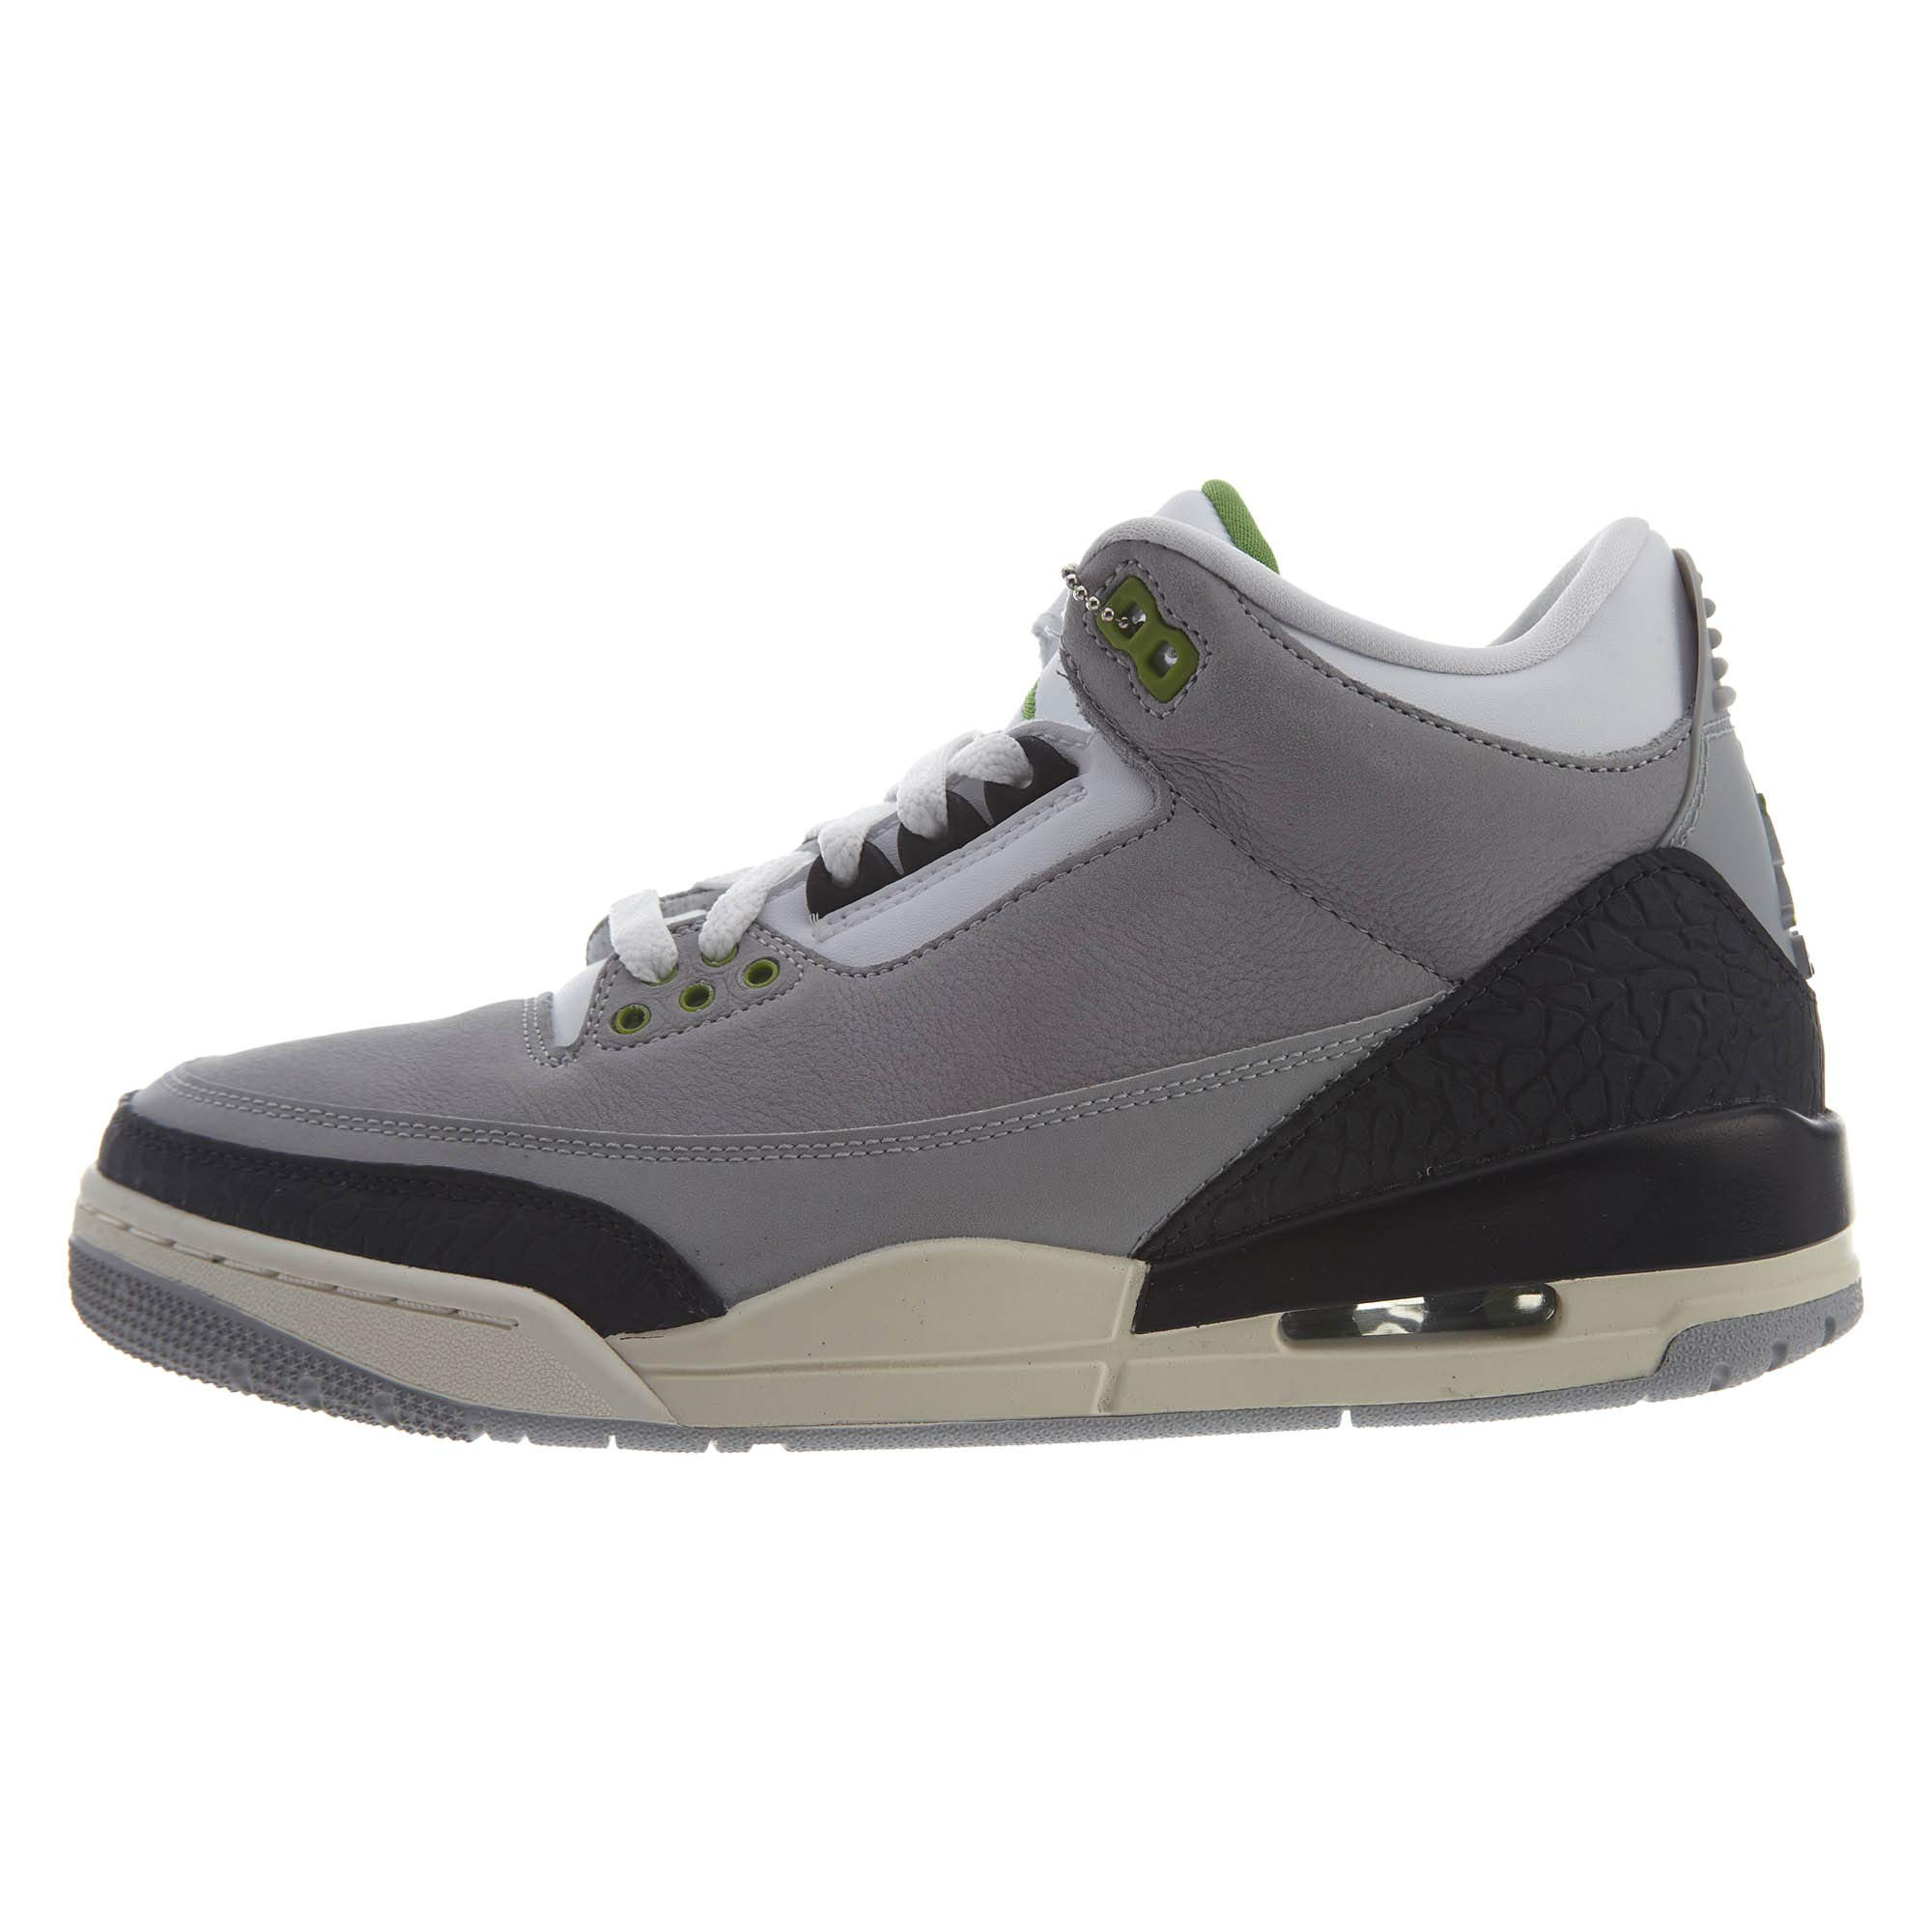 best sneakers 37926 c0ed4 Jordan 136064-006: Mens Air 3 Retro Tinker Light Grey/Chlorophyll/Black  Sneakers (12 D(M) US Men)